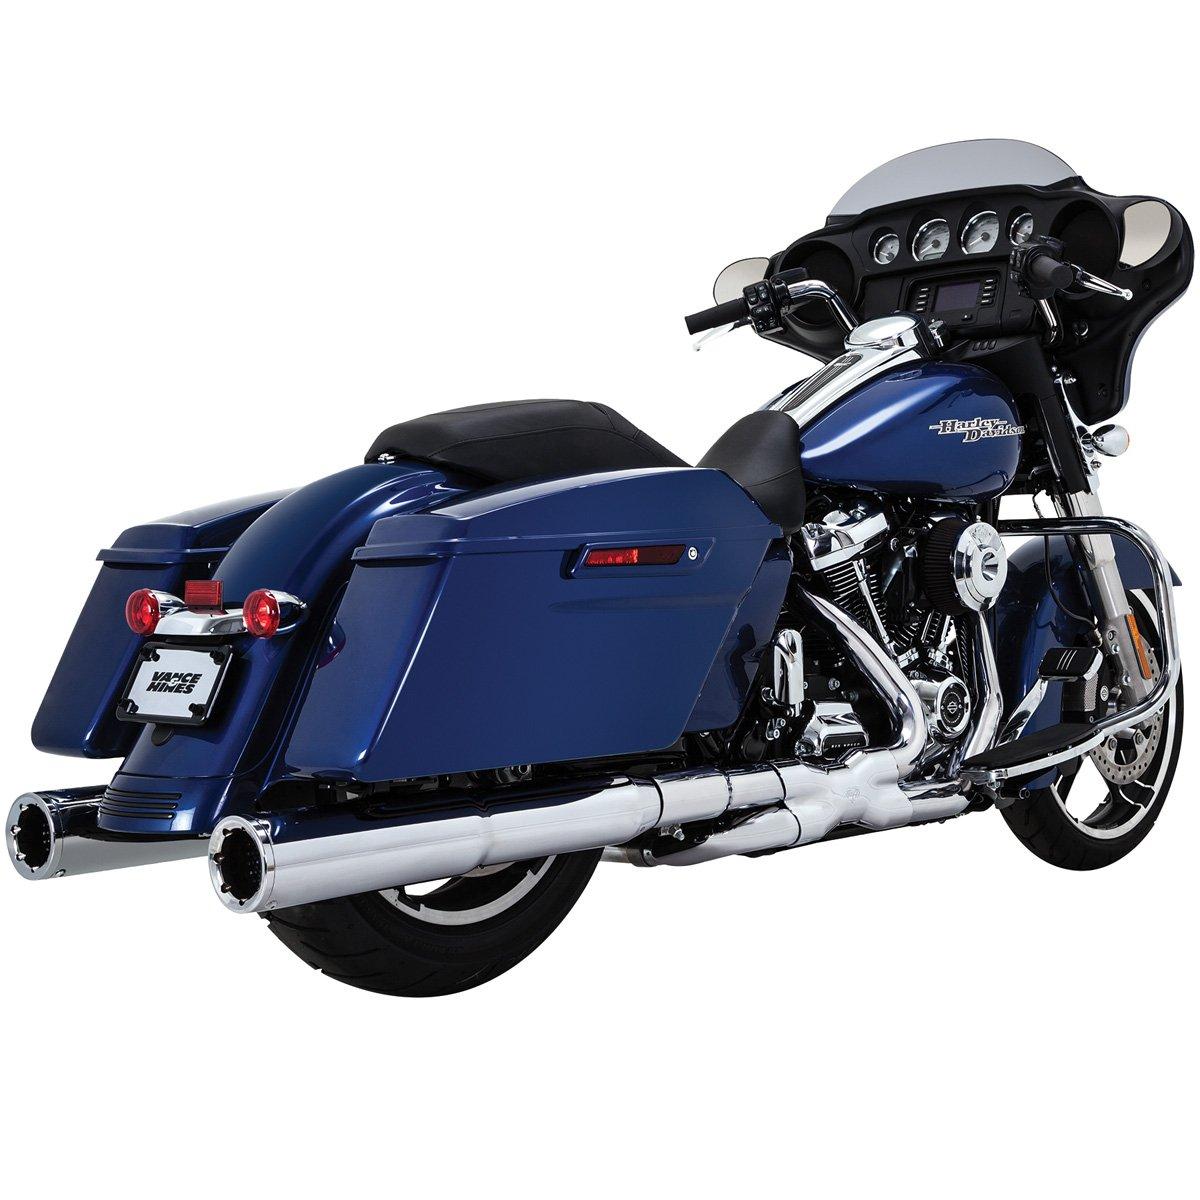 Vance & Hines 17-19 Harley FLHX2 Power Duals Headpipe System (Chrome)